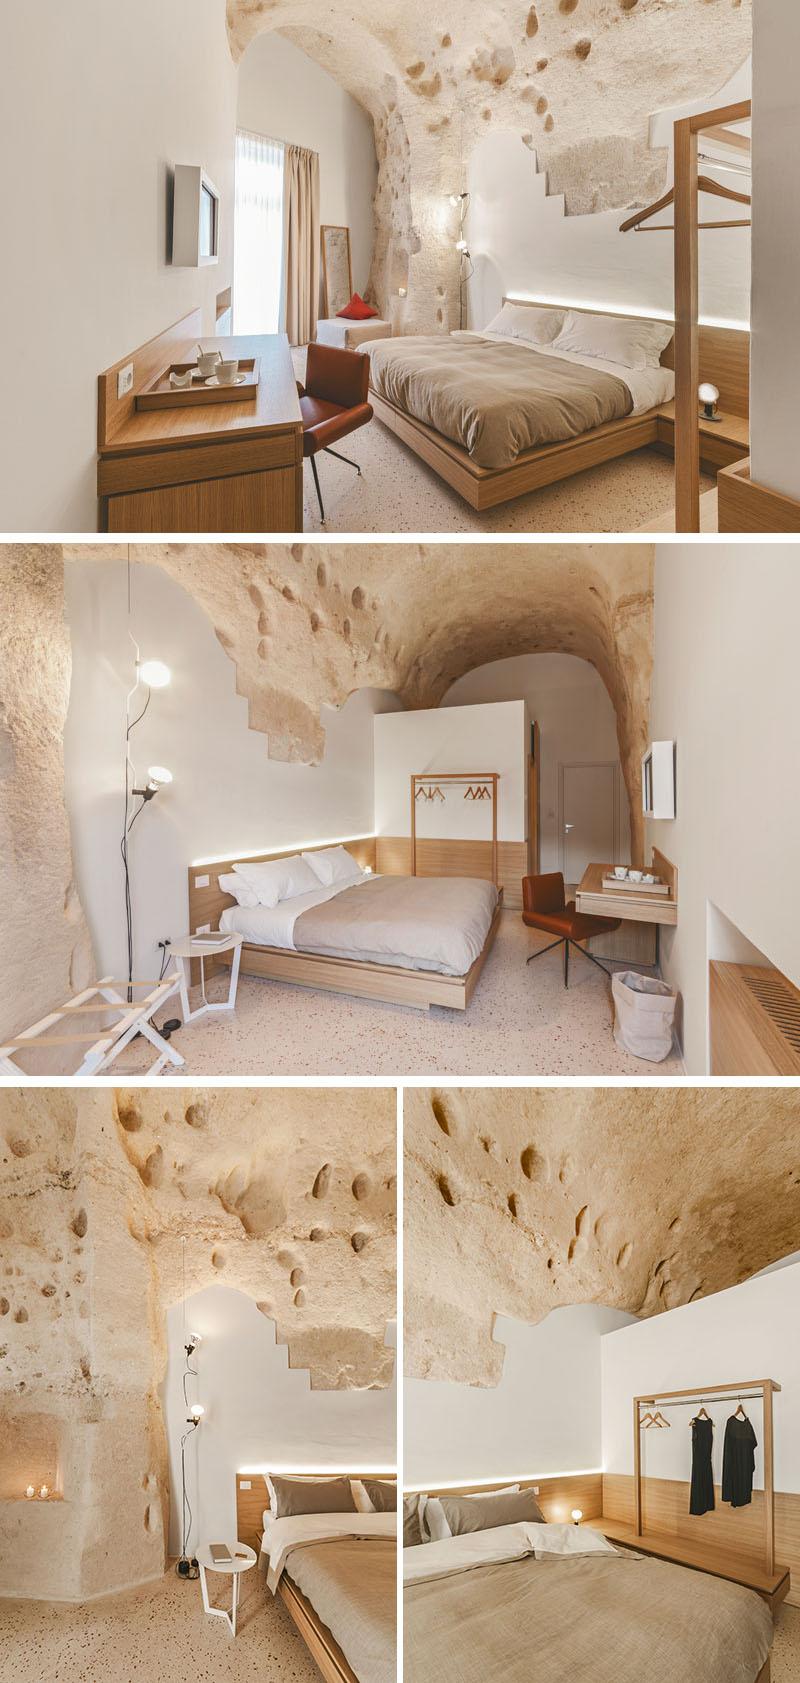 Apartamente de lux amenajate in vechile caverne - Apartamente de lux amenajate in vechile caverne